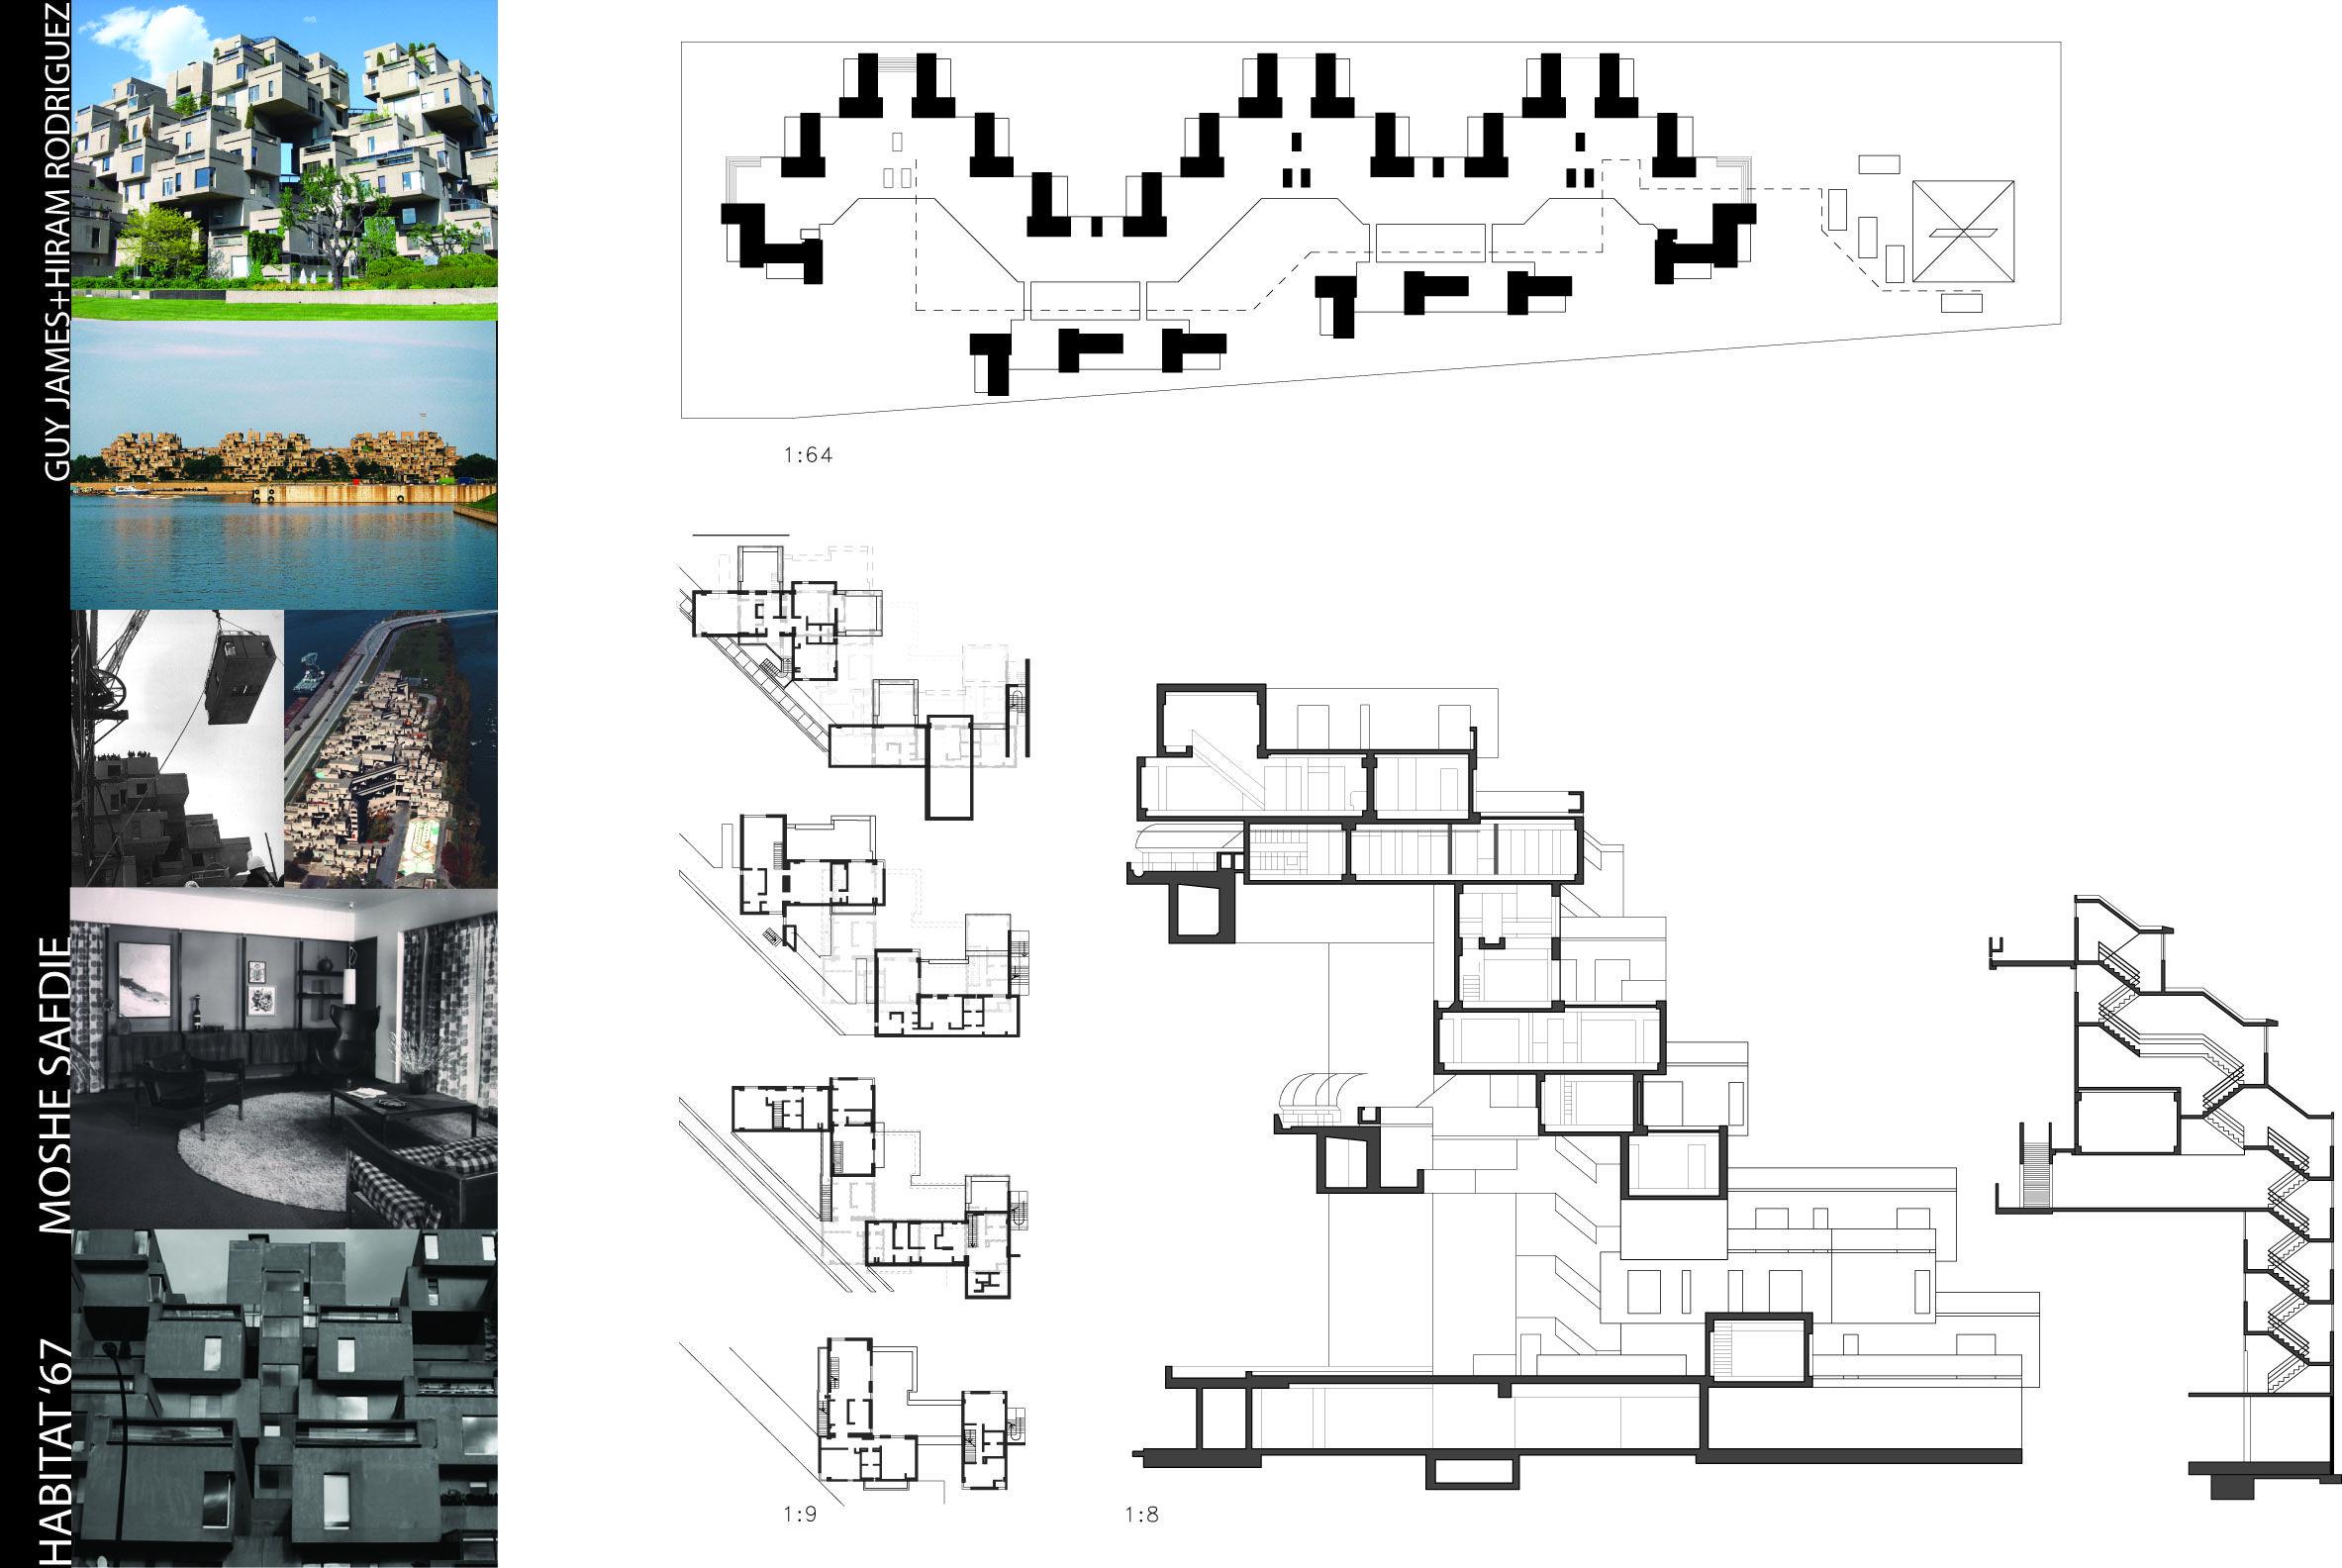 Habitat 67 cerca con google habitate 67 pinterest architecture architecture ccuart Gallery